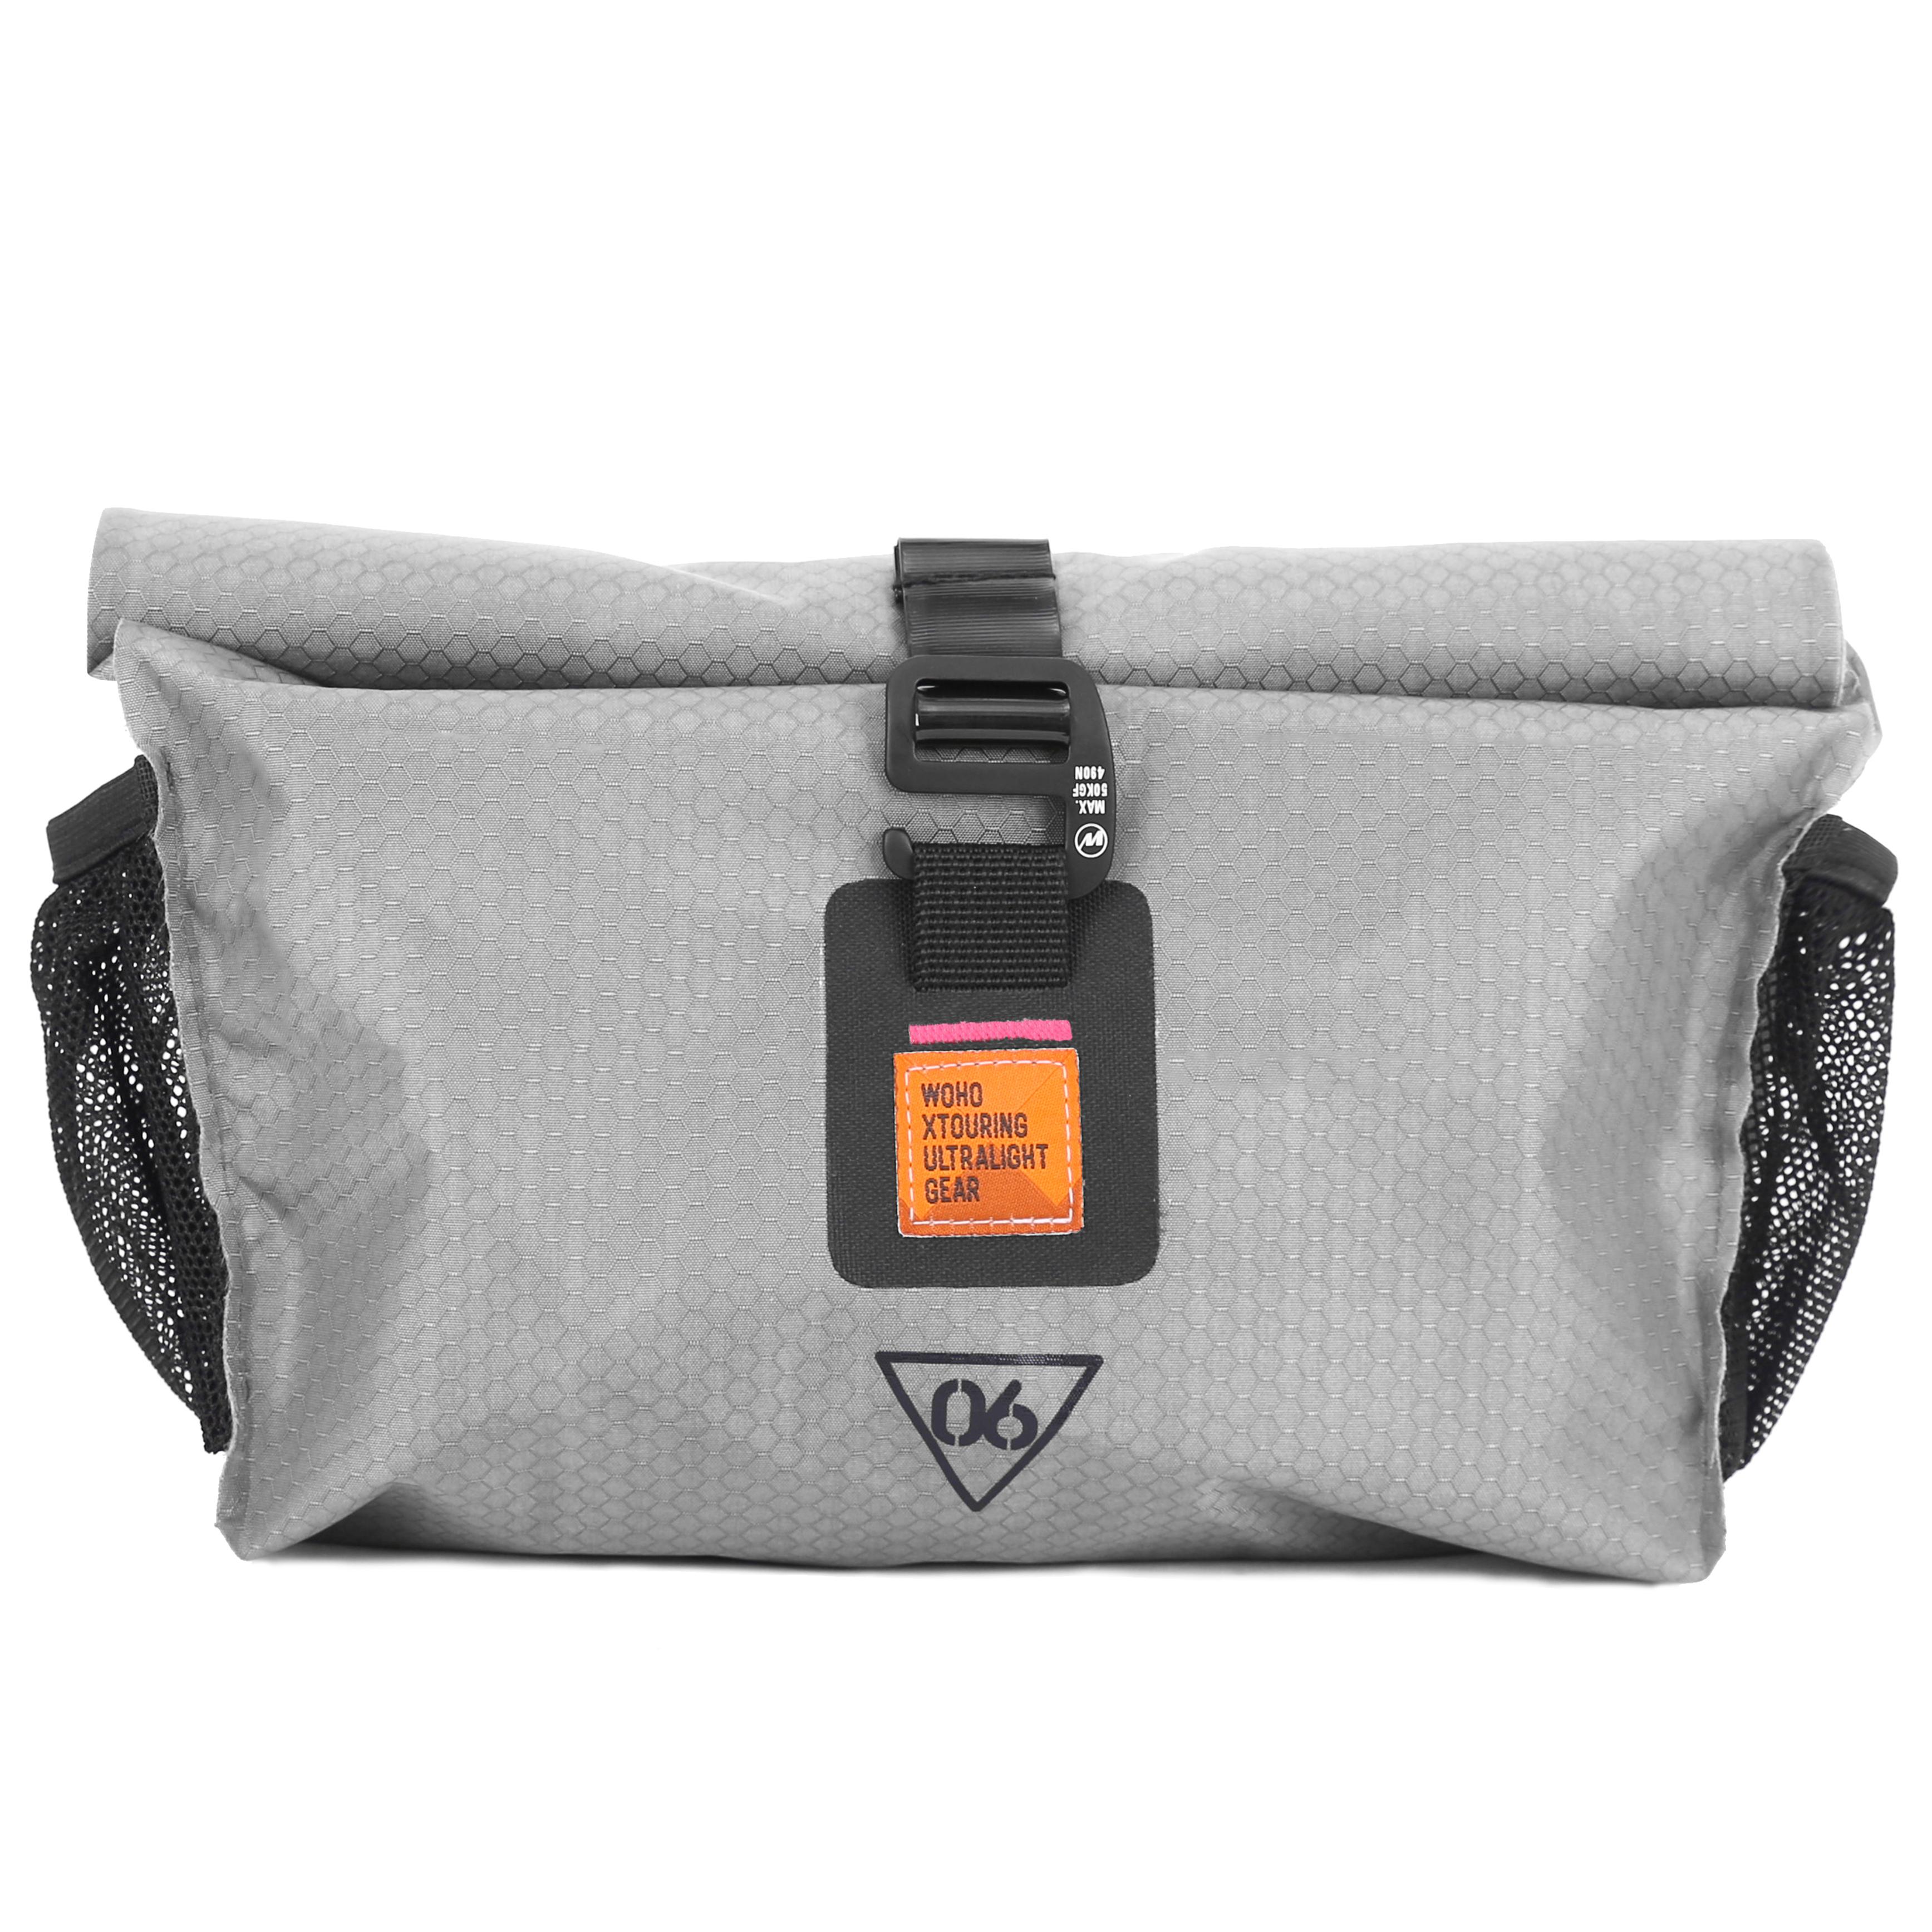 Woho X-Touring Accessory Dry Bag